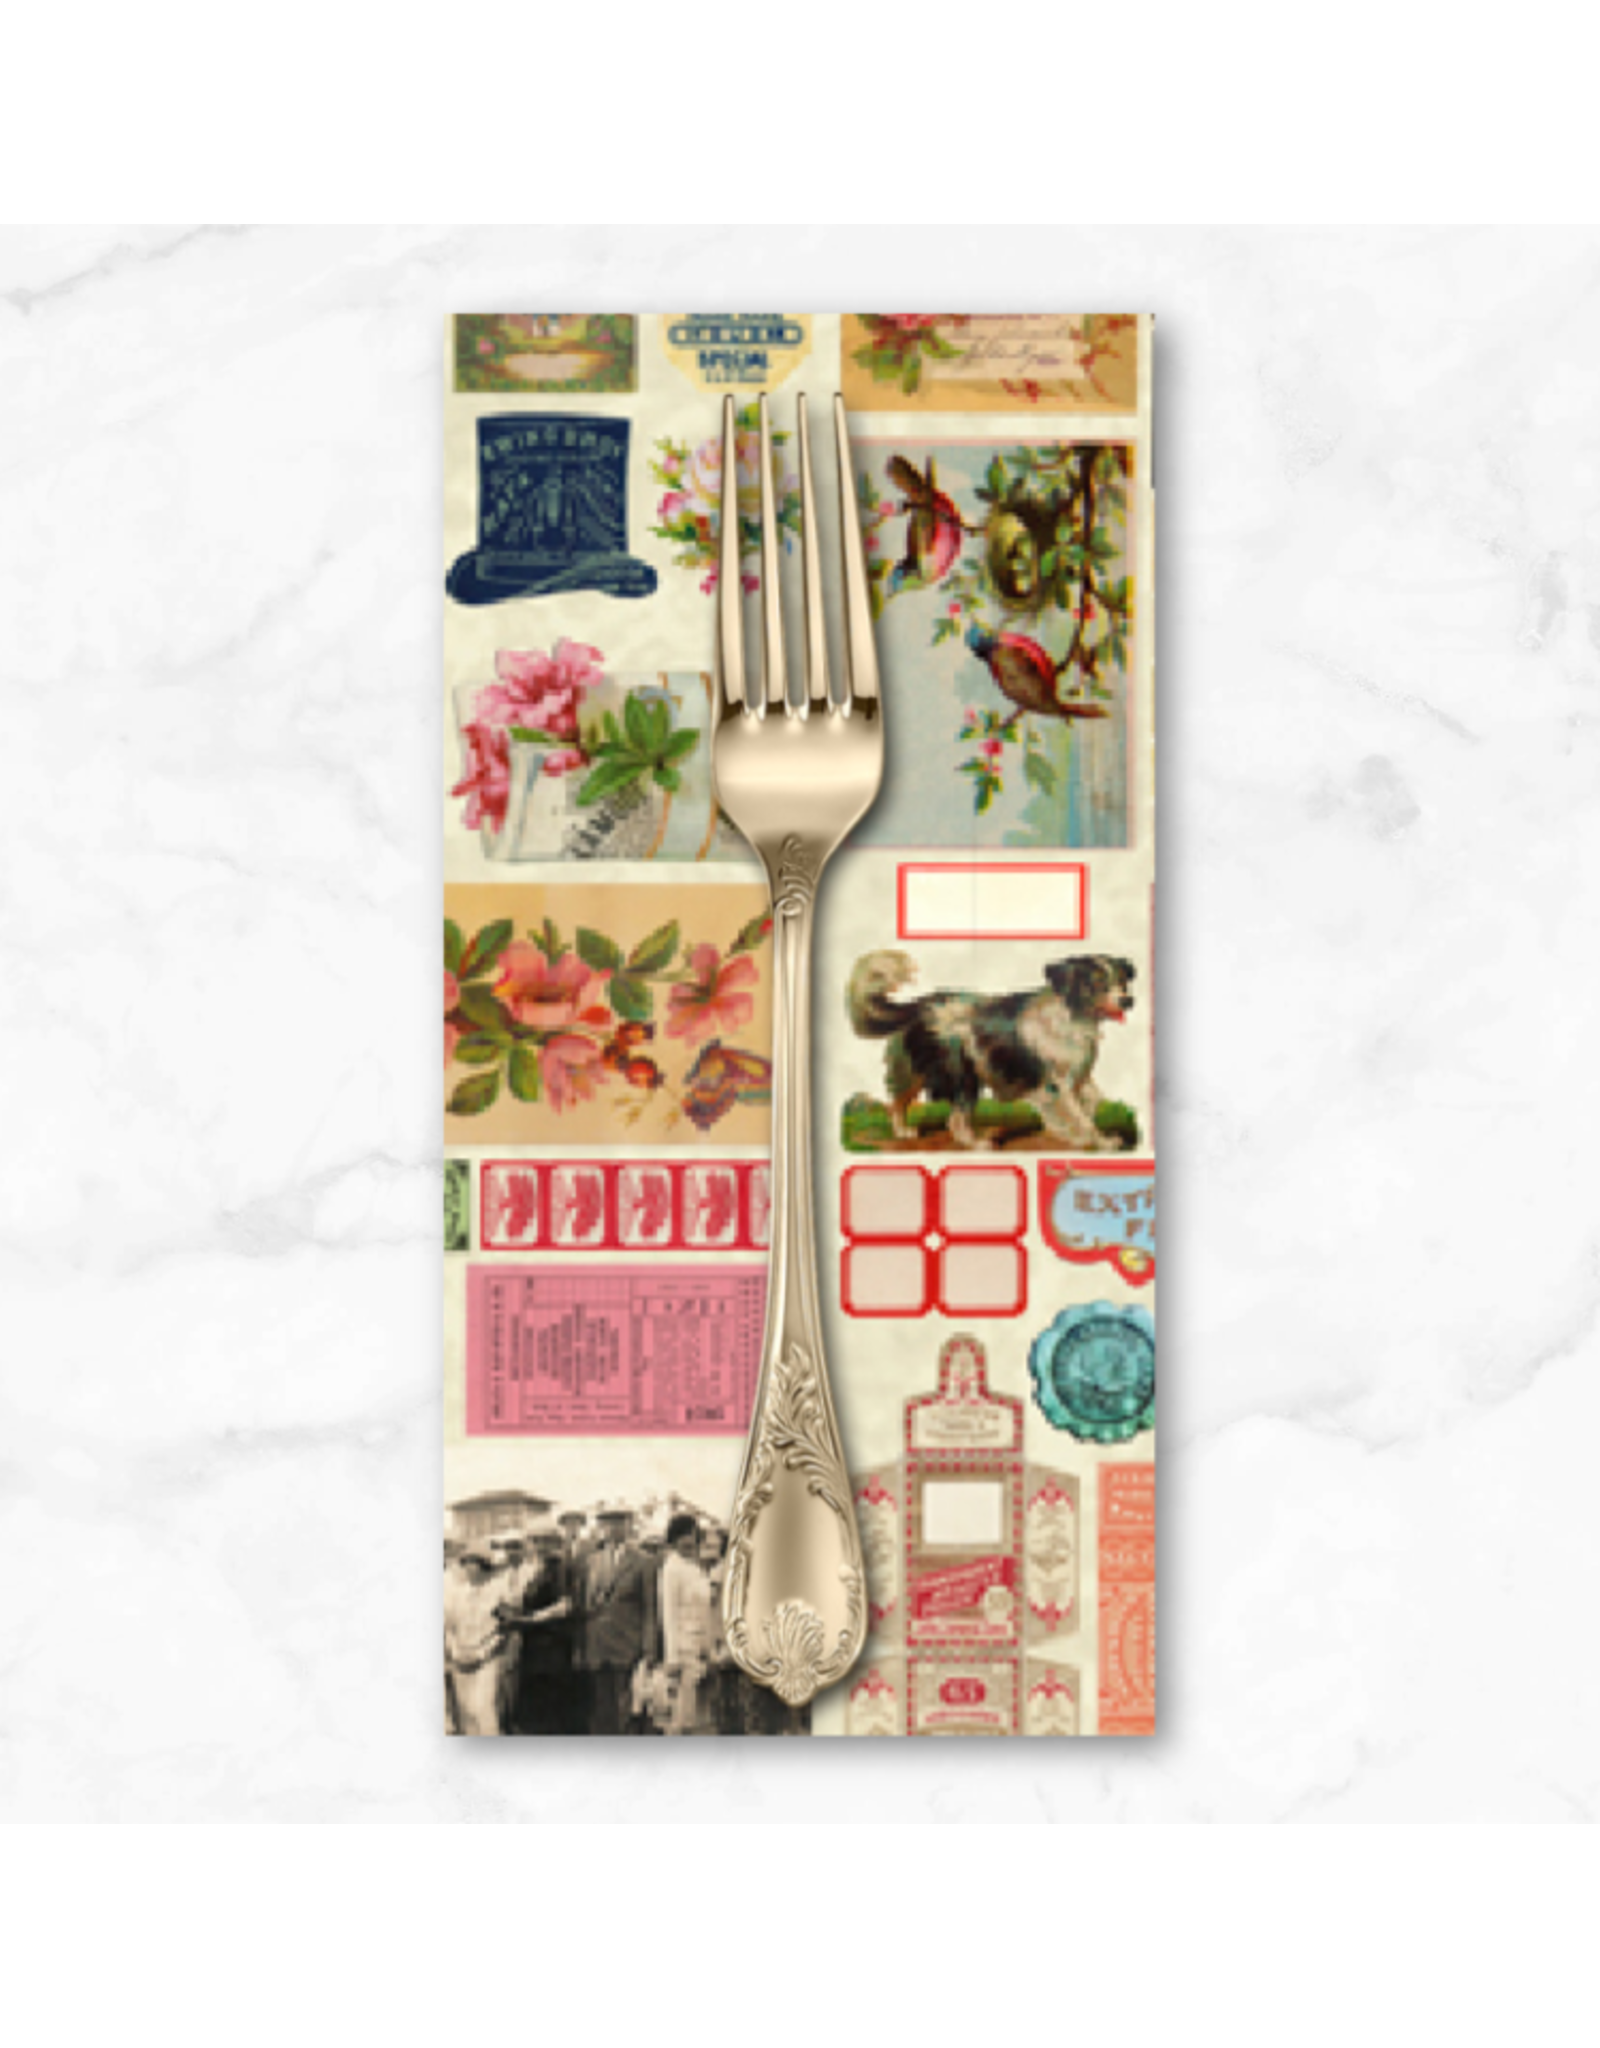 PD's Moda Collection Flea Market Moxie, Ephemera Flat Lay Mix in Parchment, Dinner Napkin